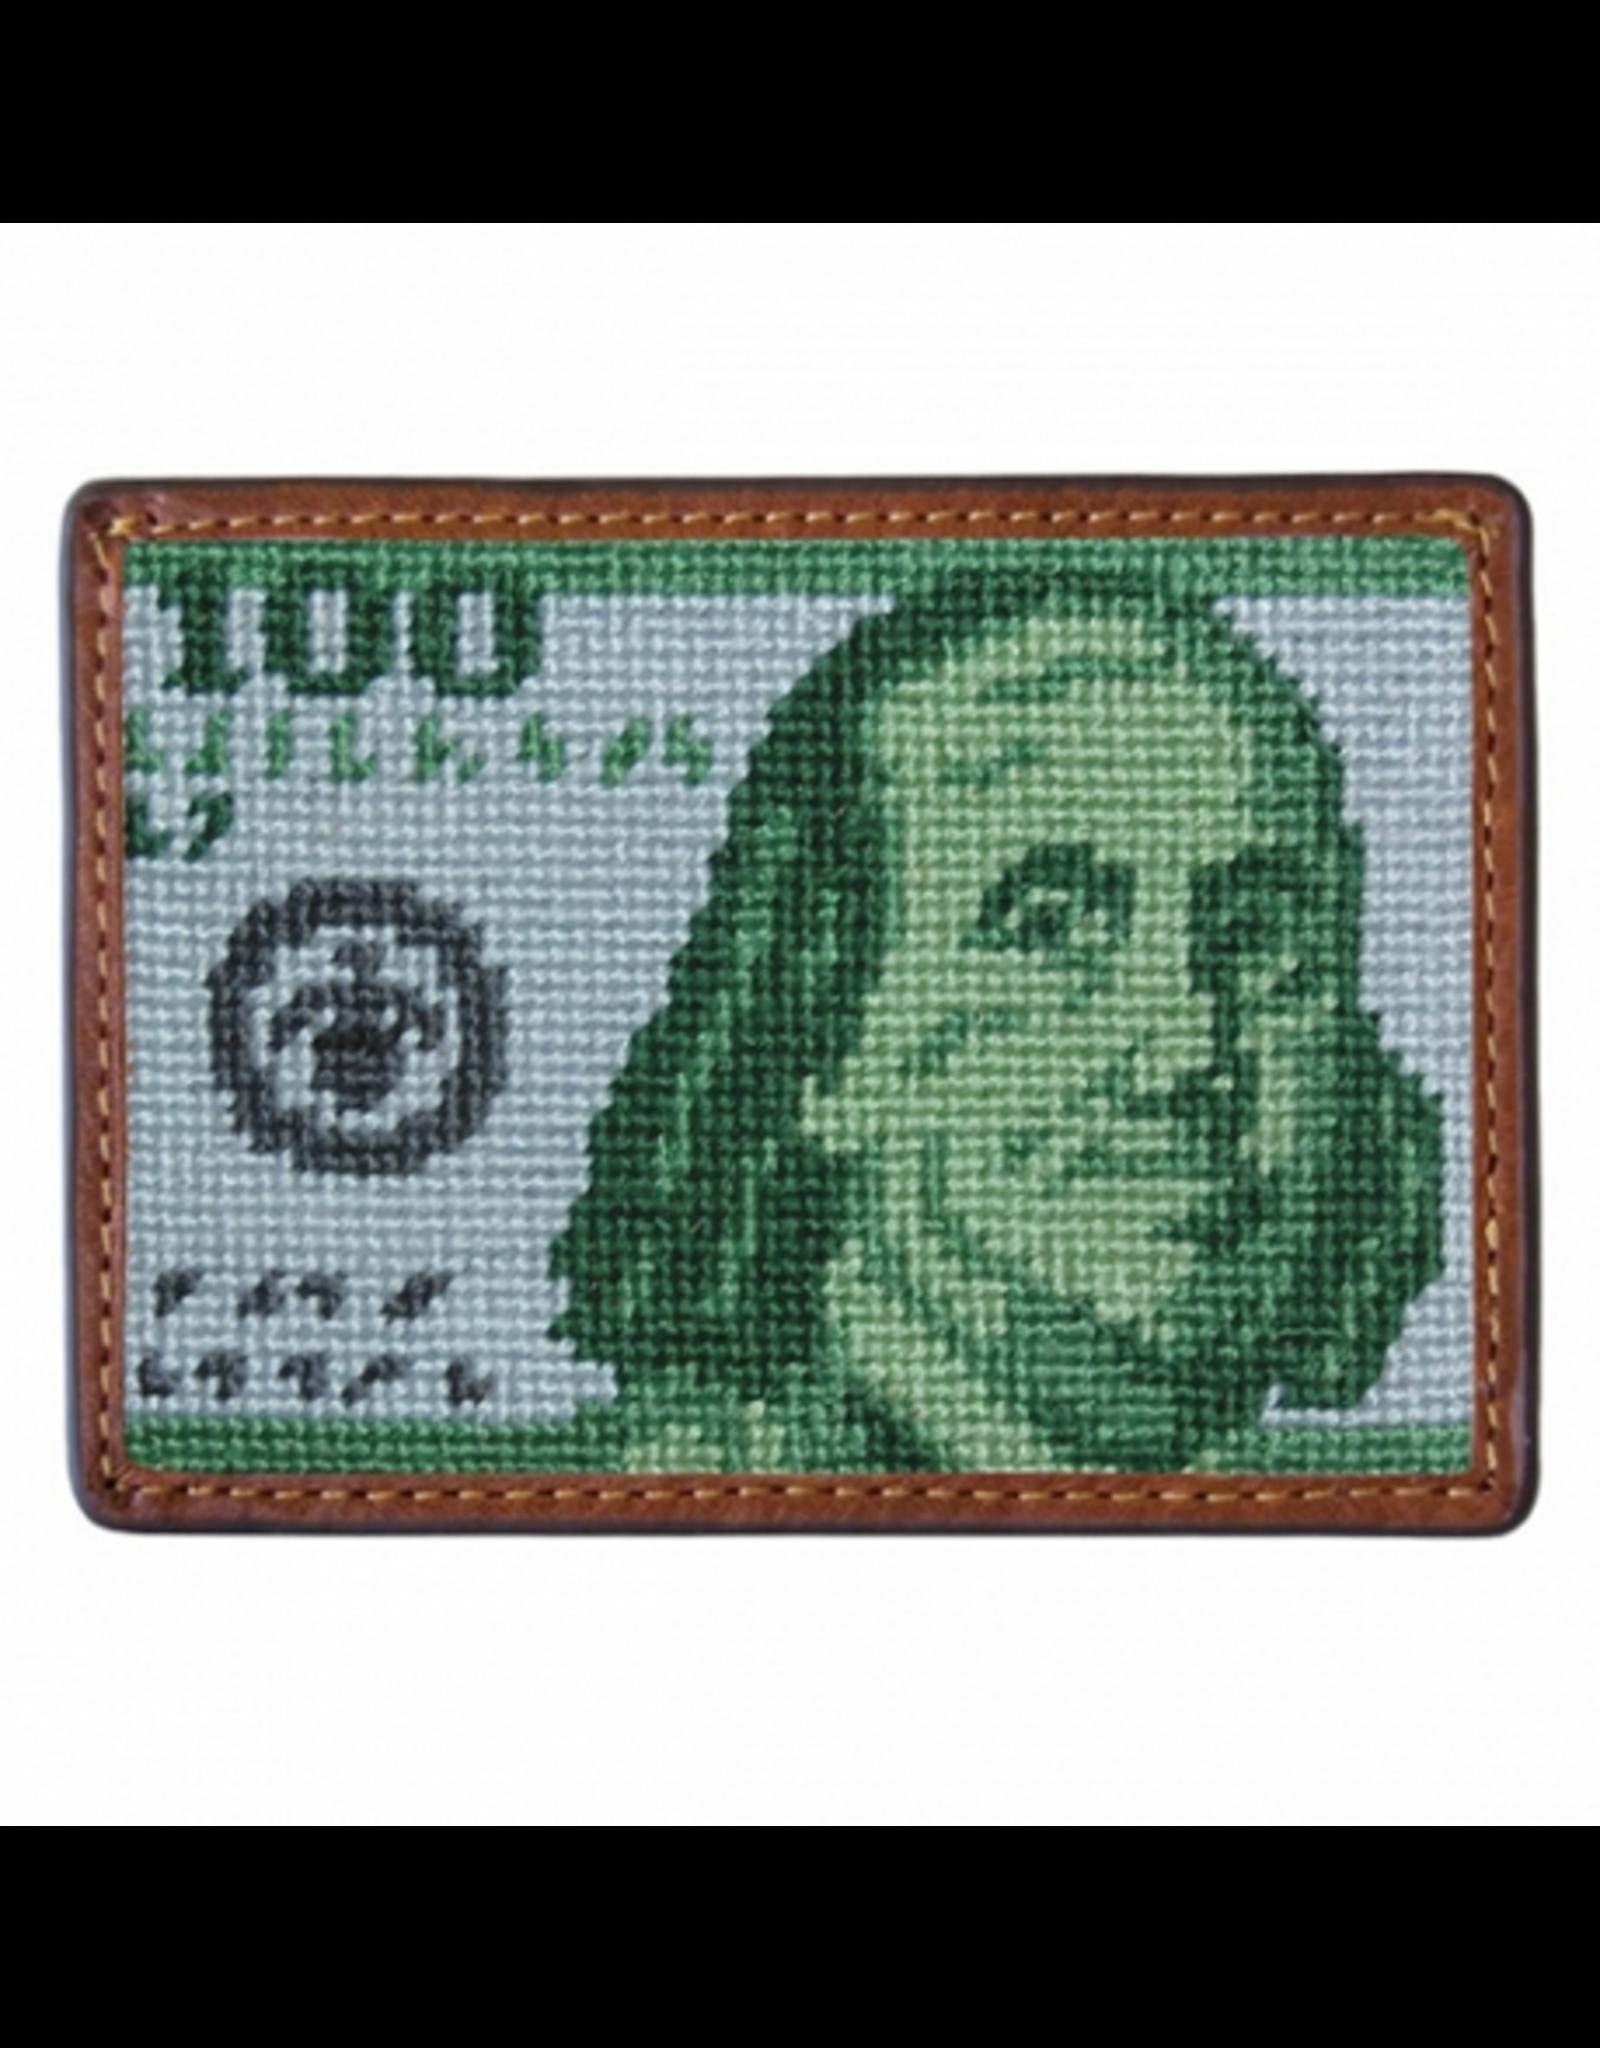 Smathers & Branson S&B Needlepoint Card Wallet, Benjamin